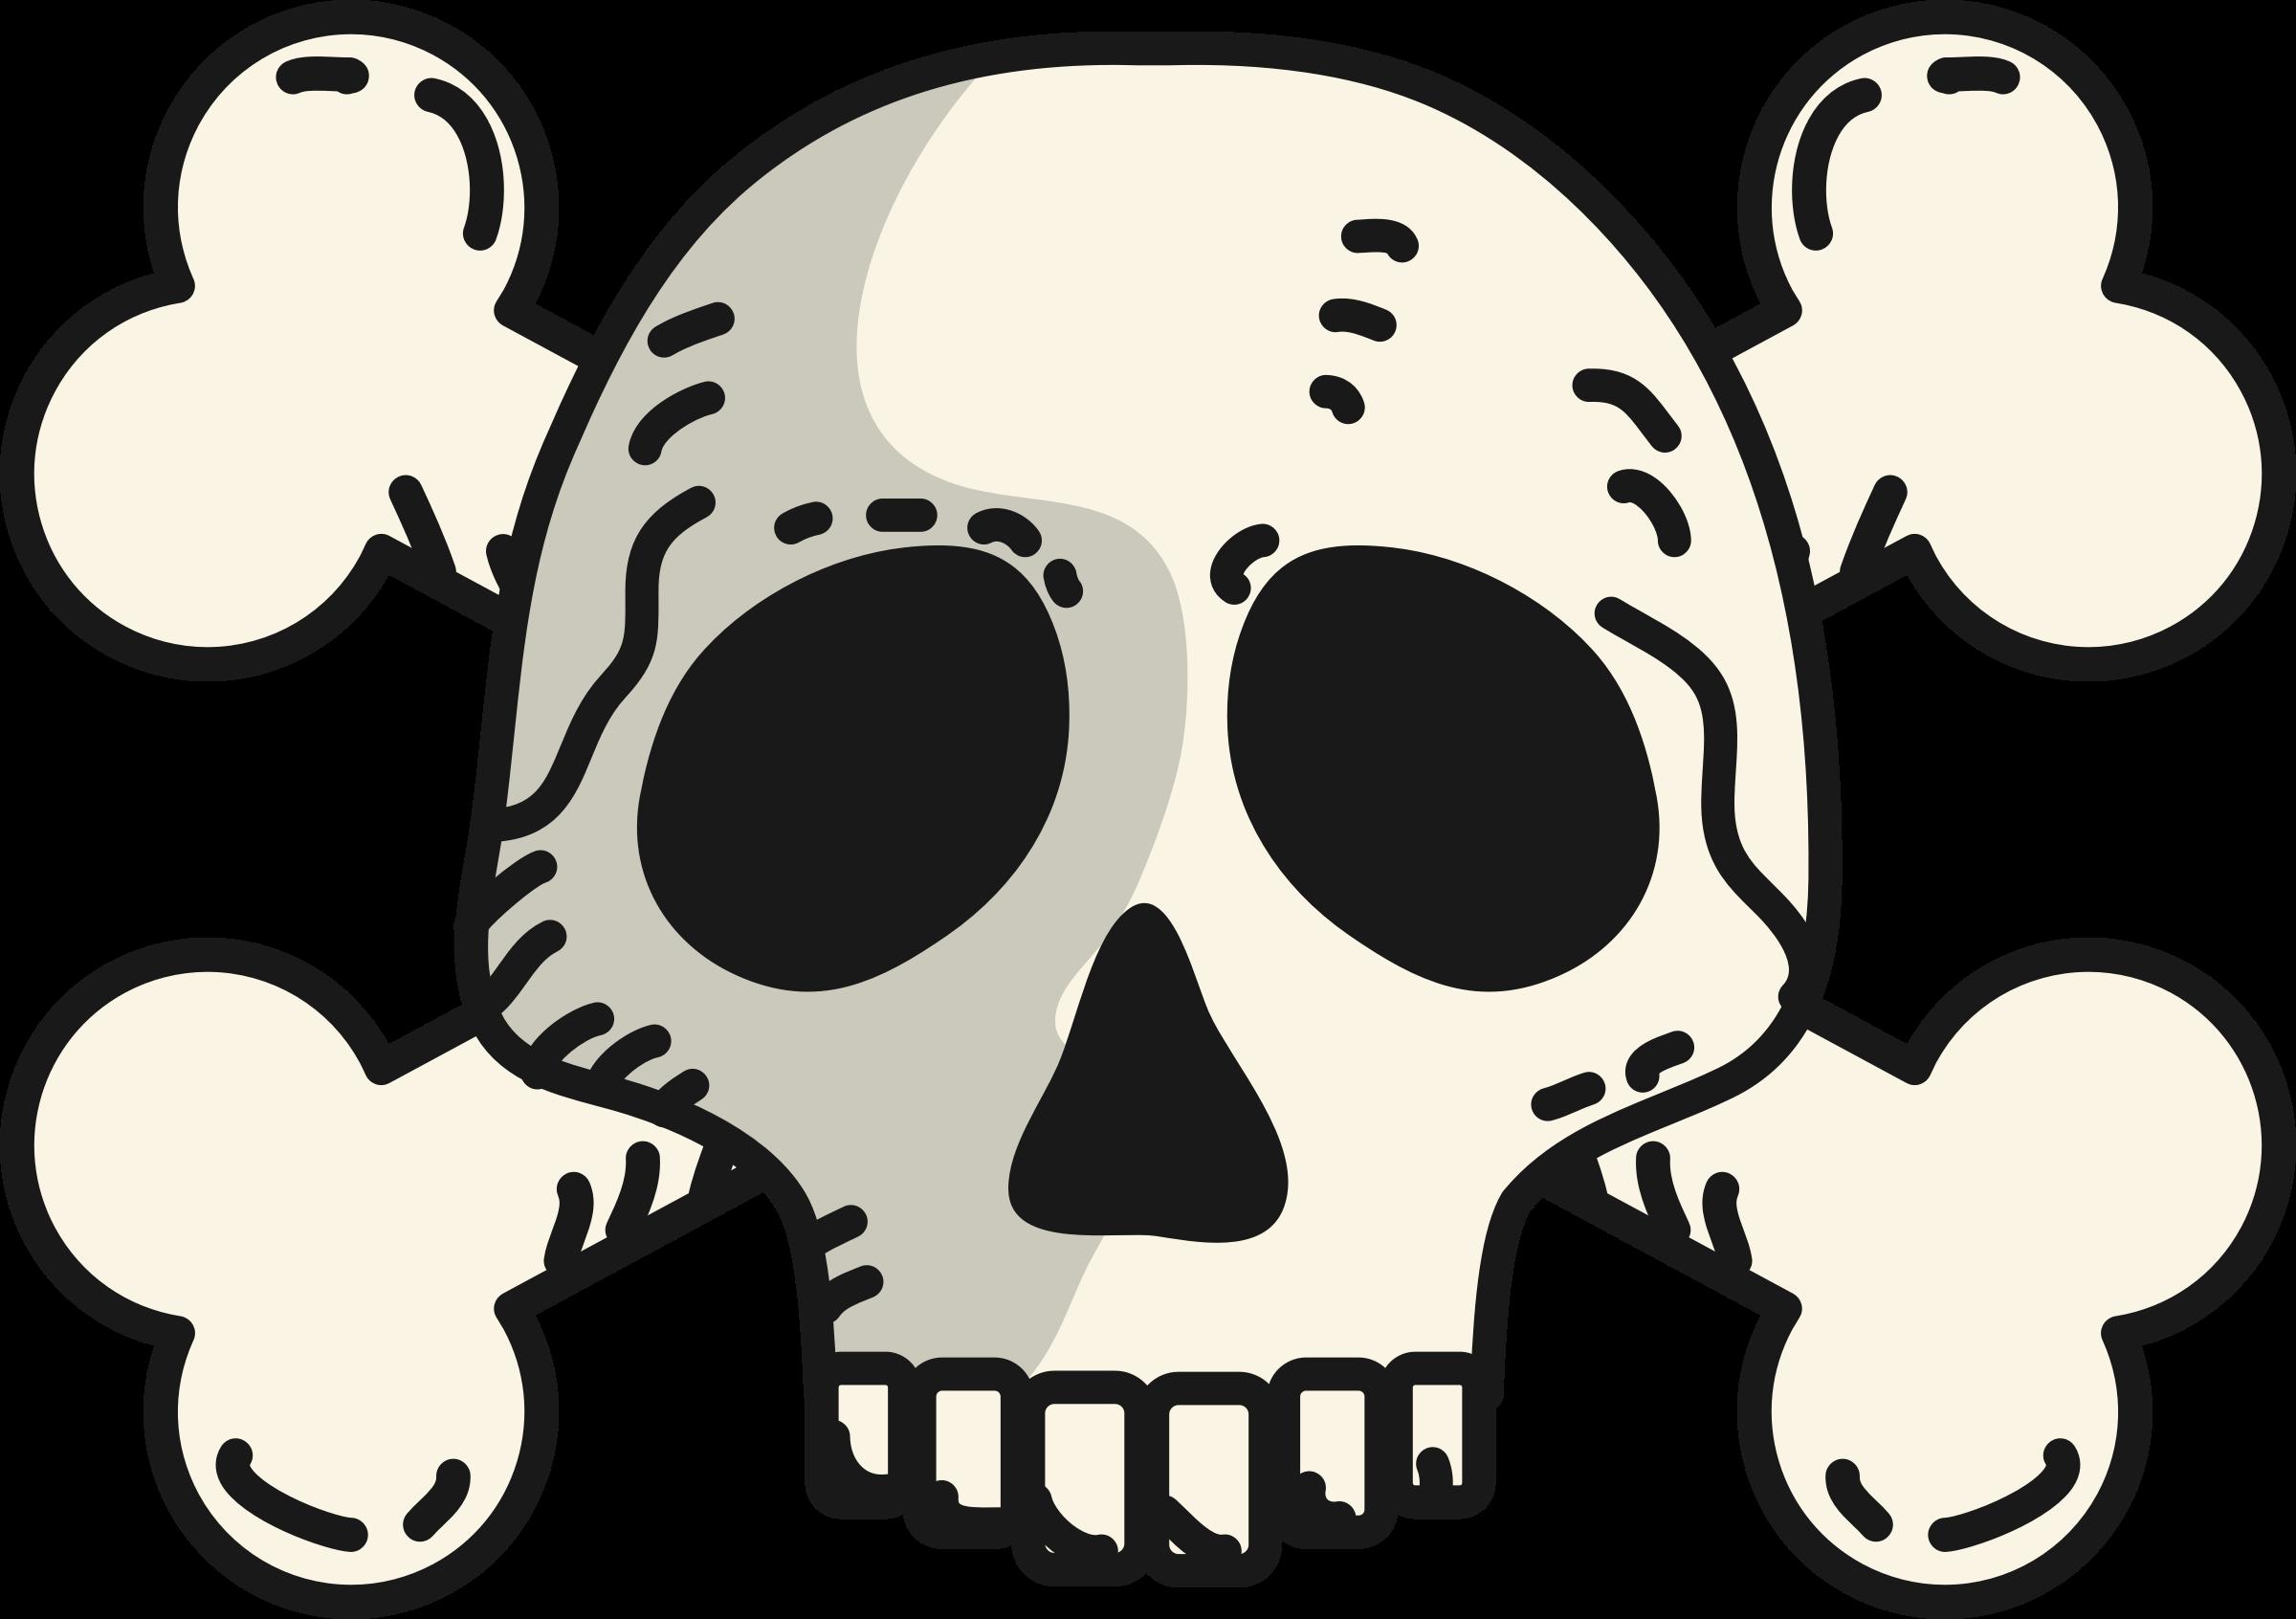 svg download Skull and crossbones clipart. Bones vector cartoon